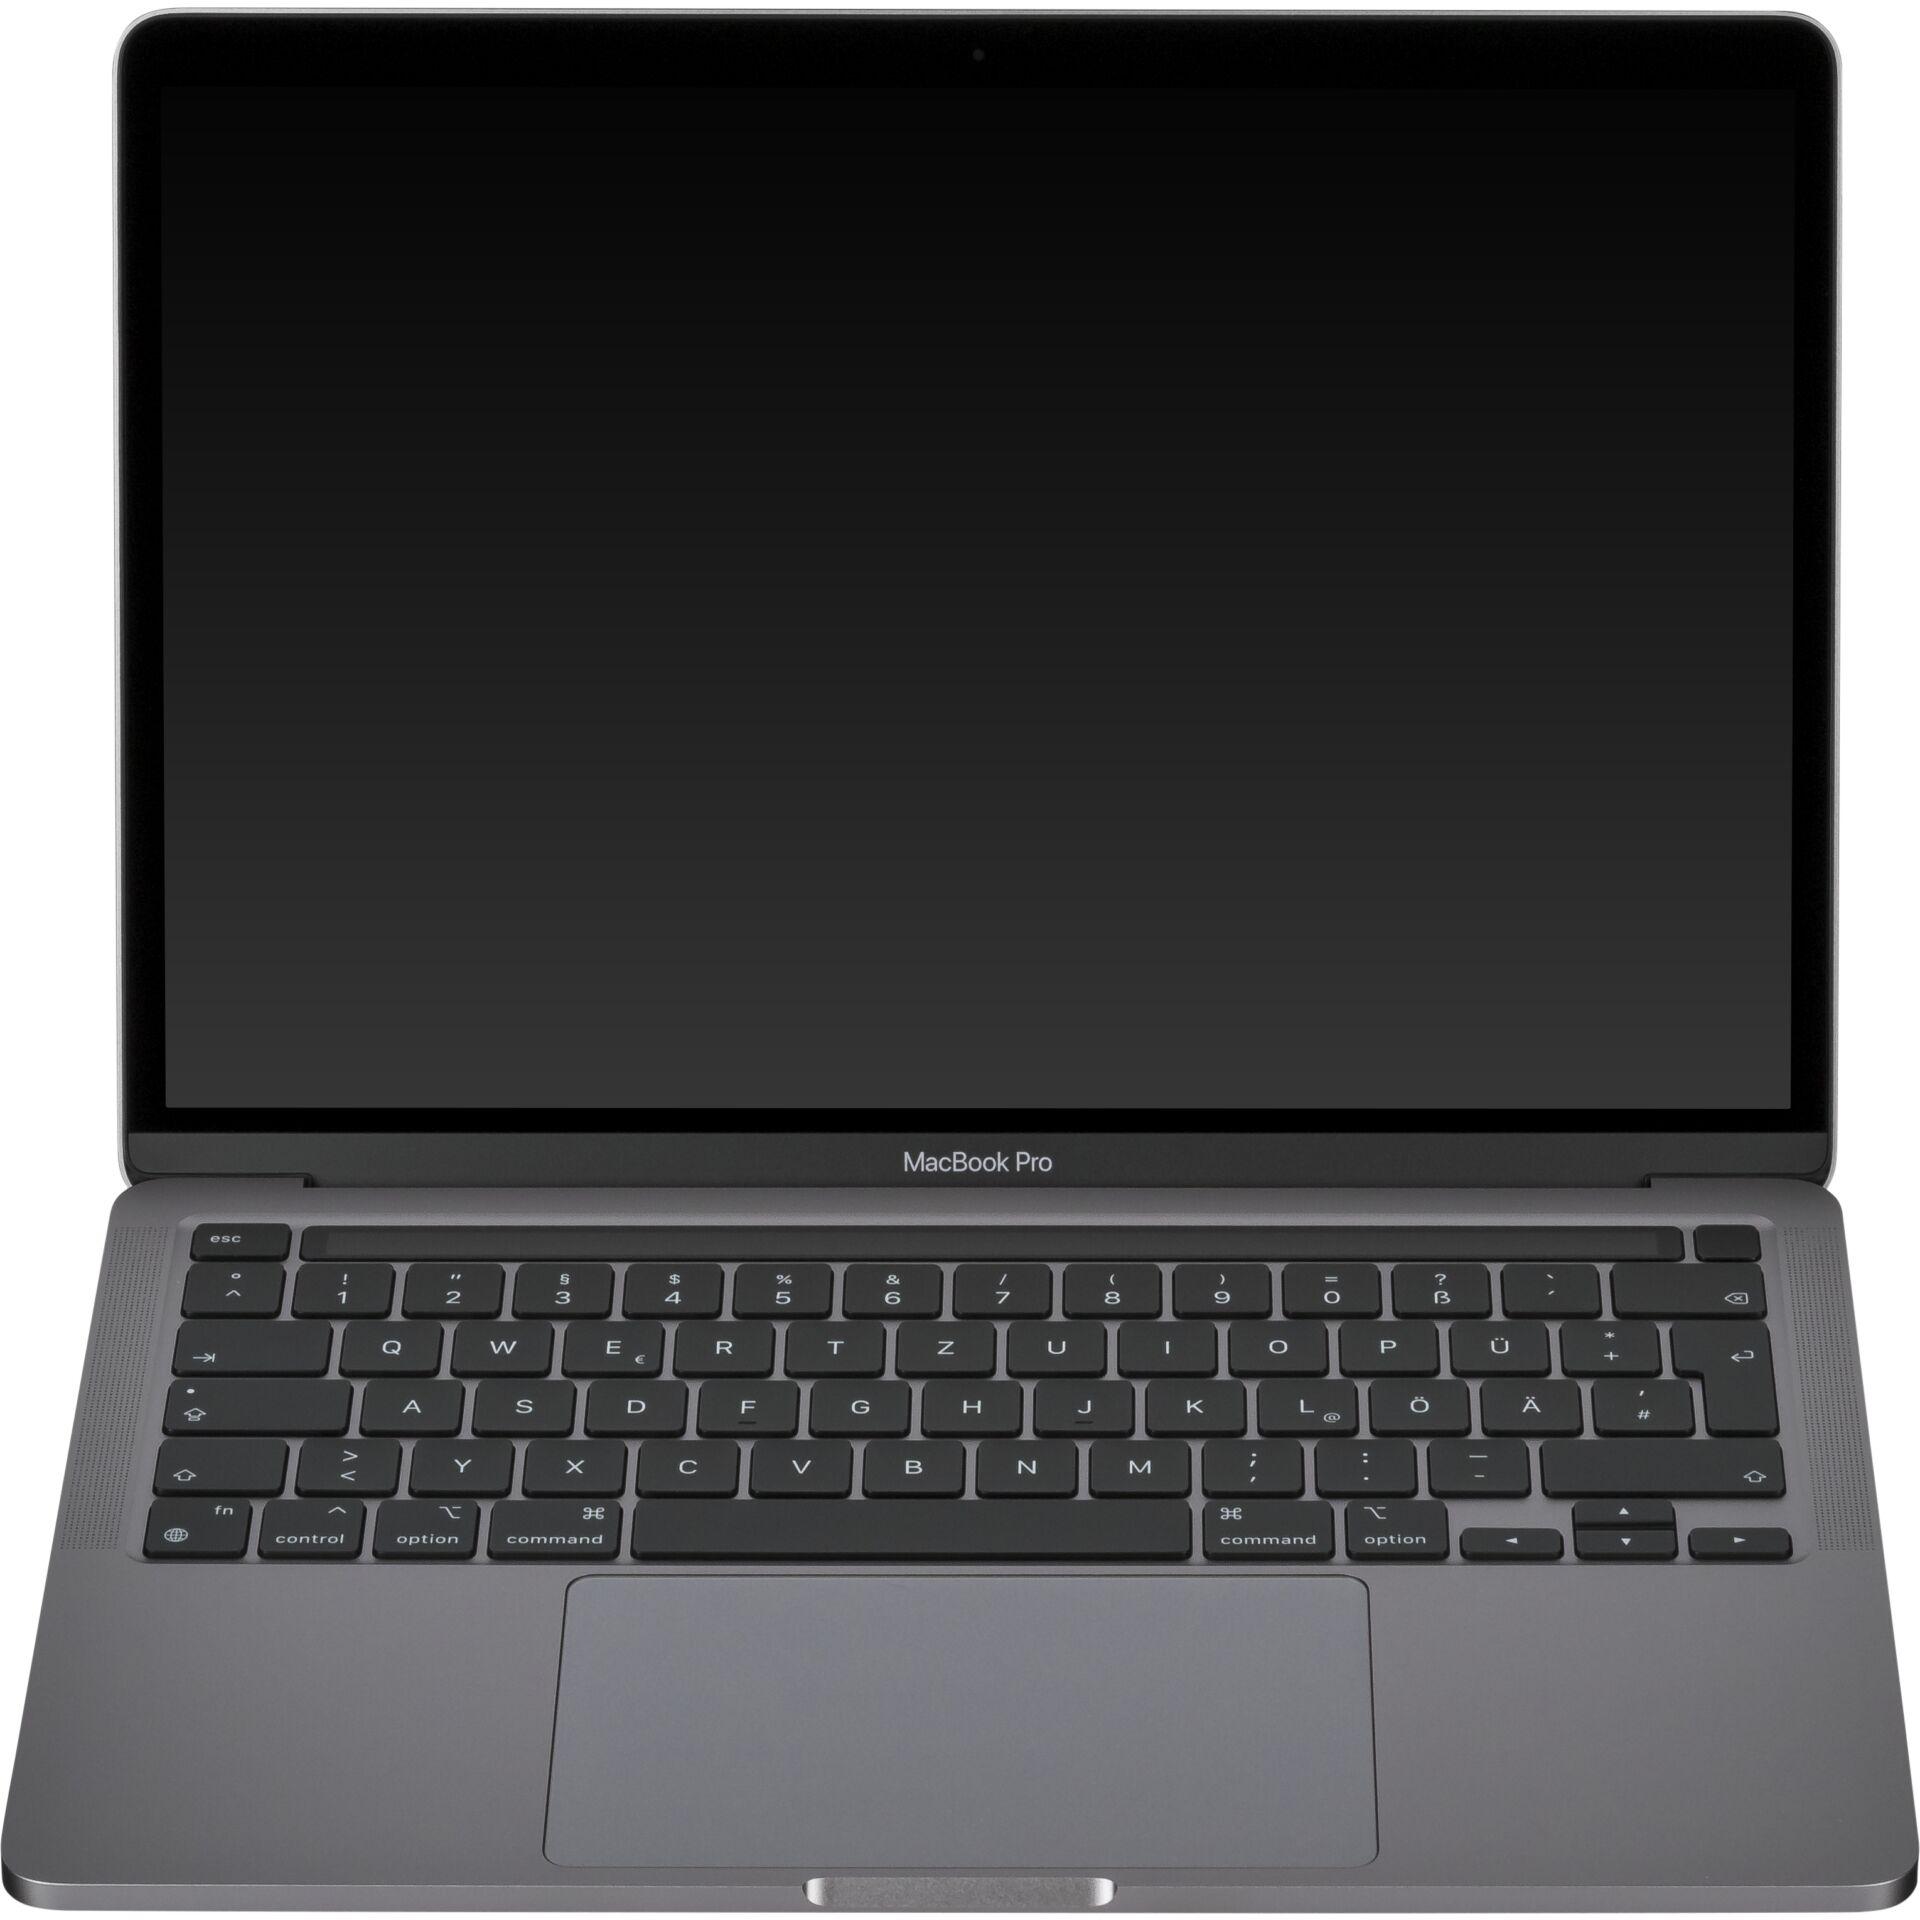 Apple MacBook Pro 13-inch CPU M1 8GB 512GB SSD - space grey